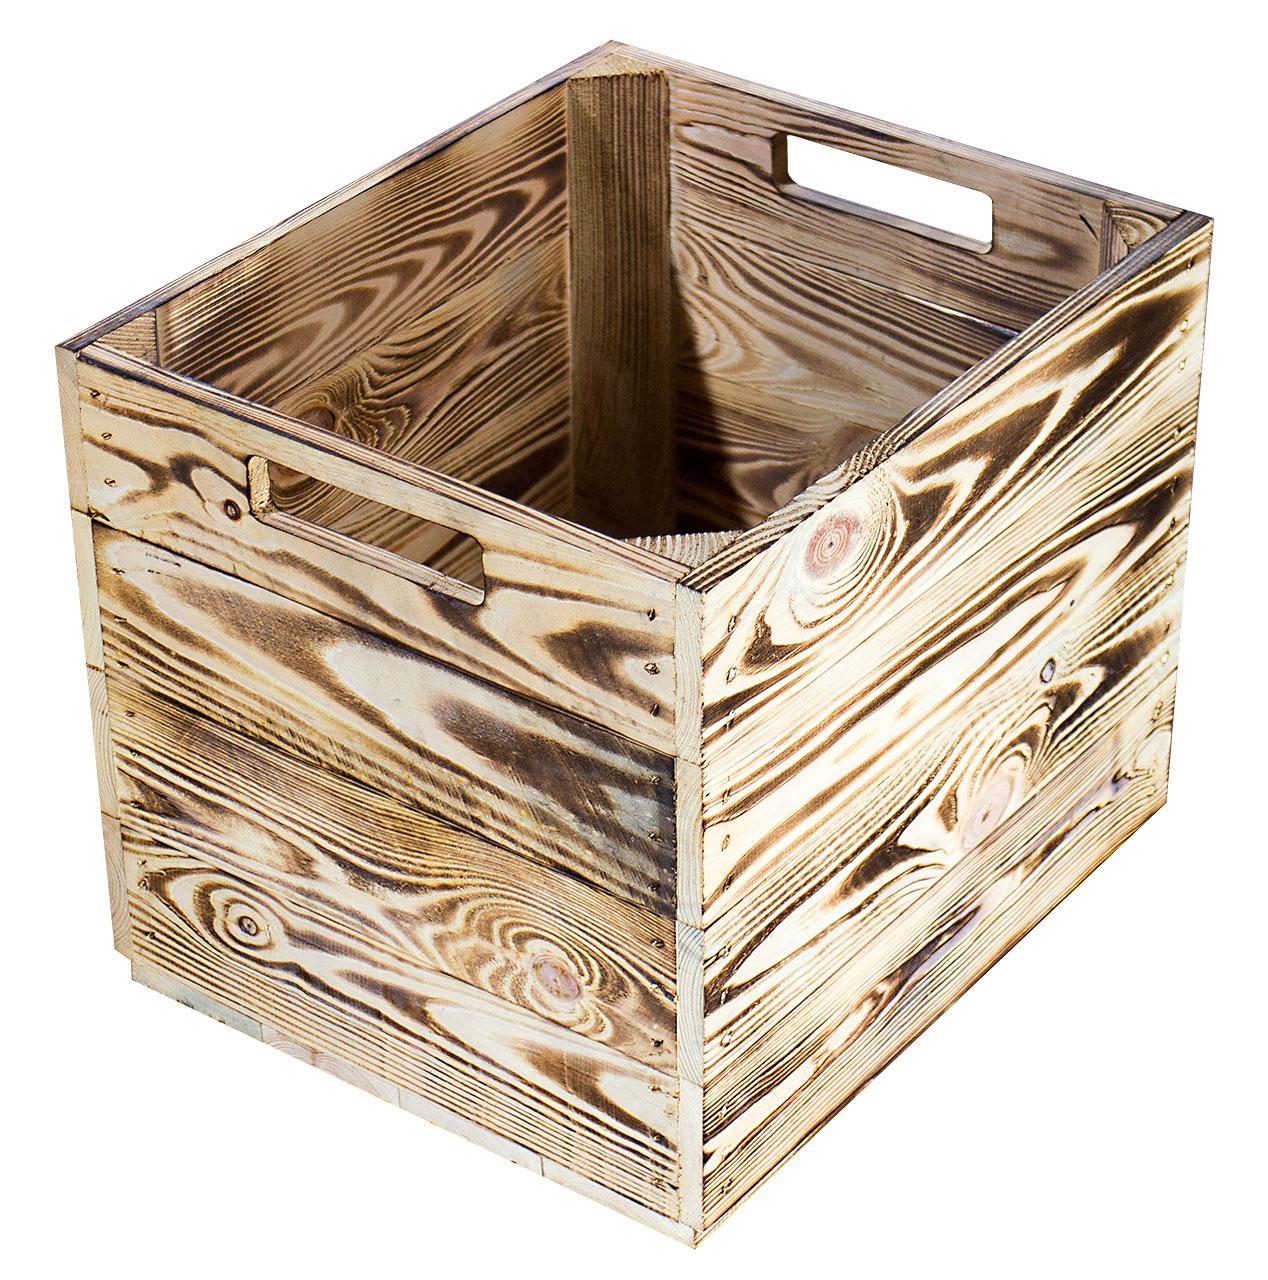 Full Size of Regal Aus Kisten Ikea Regale Holzkisten Selber Bauen Kaufen Basteln Holz Bauanleitung System Geflammte Produkte Kiste Fr Kallaregale 33x37 Weiß Hochglanz Regal Regal Aus Kisten